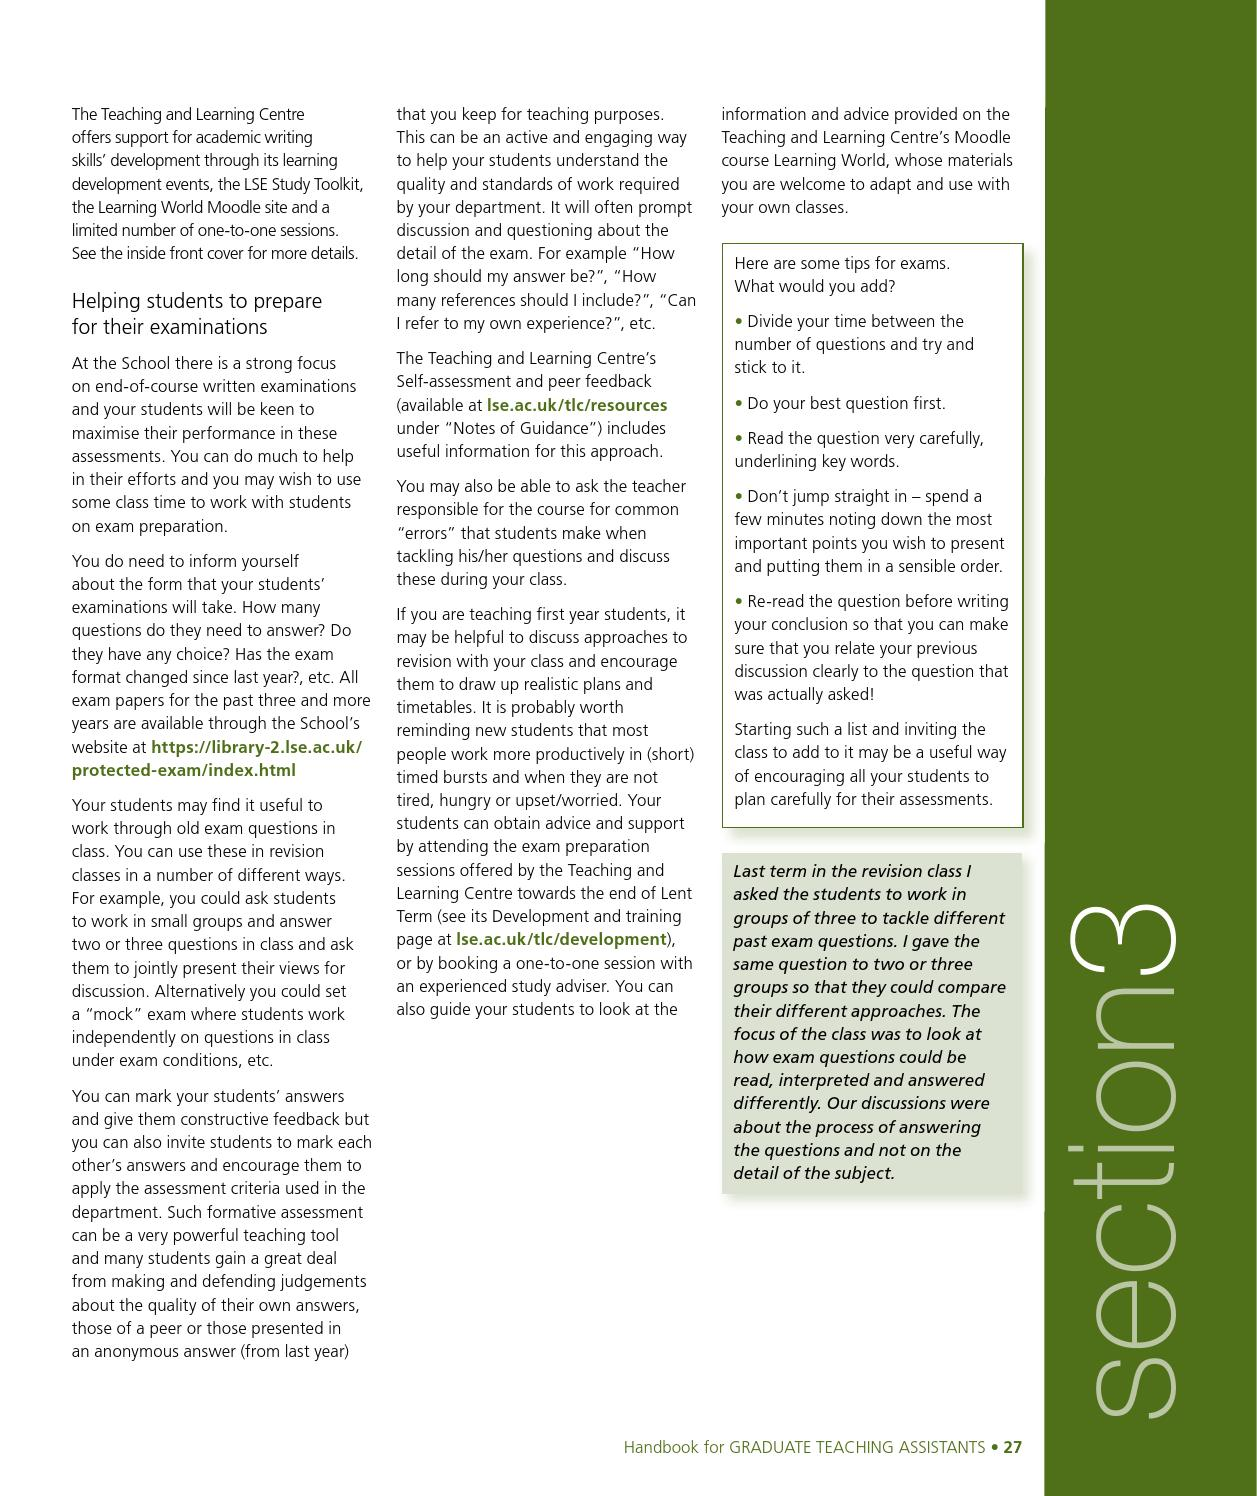 LSE TLC GTA handbook 2015/16 by London School of Economics - issuu